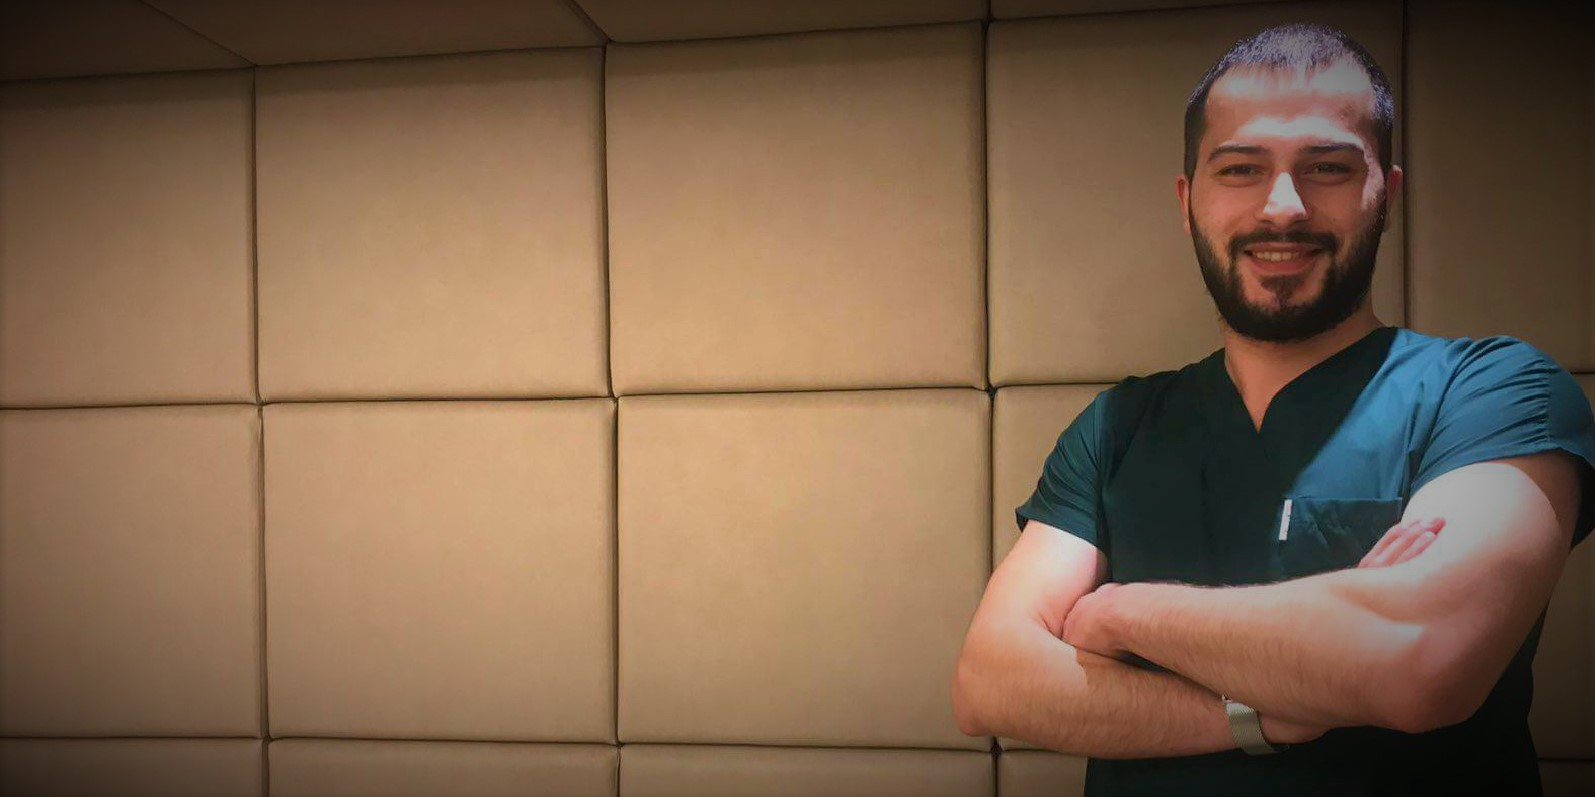 دكتور اوغور يافوز | D.Uğur Yavuz